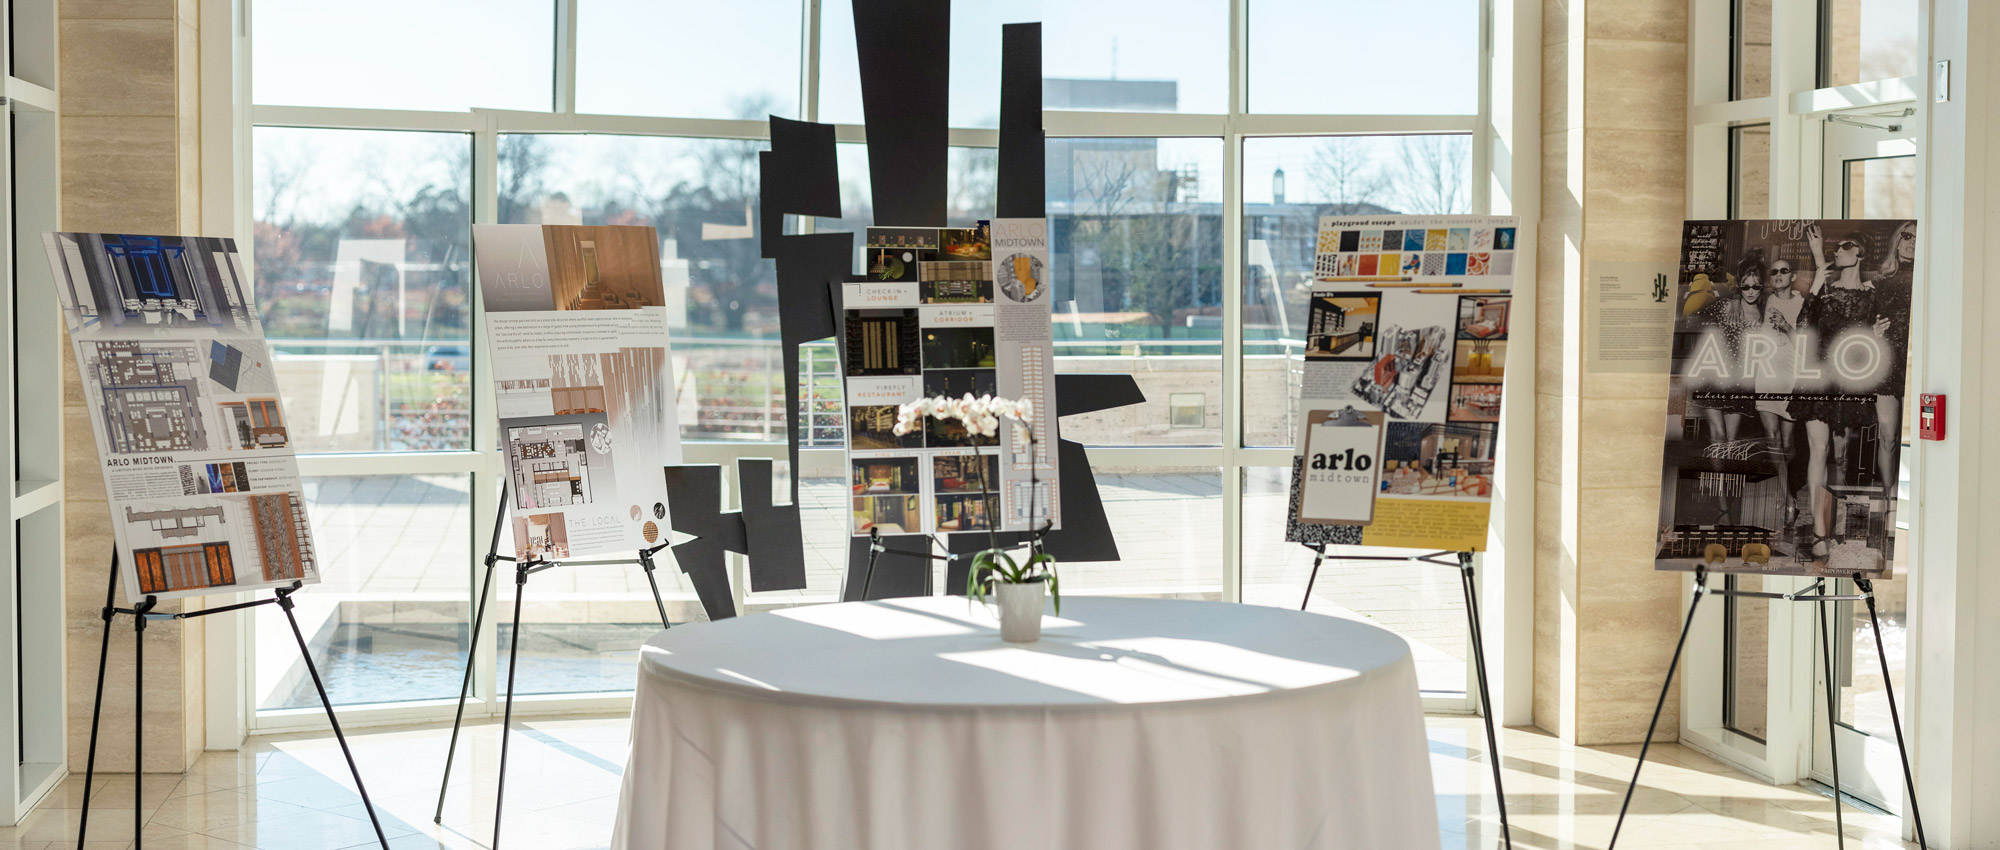 Auburn university college of human sciences interior - Auburn university interior design program ...